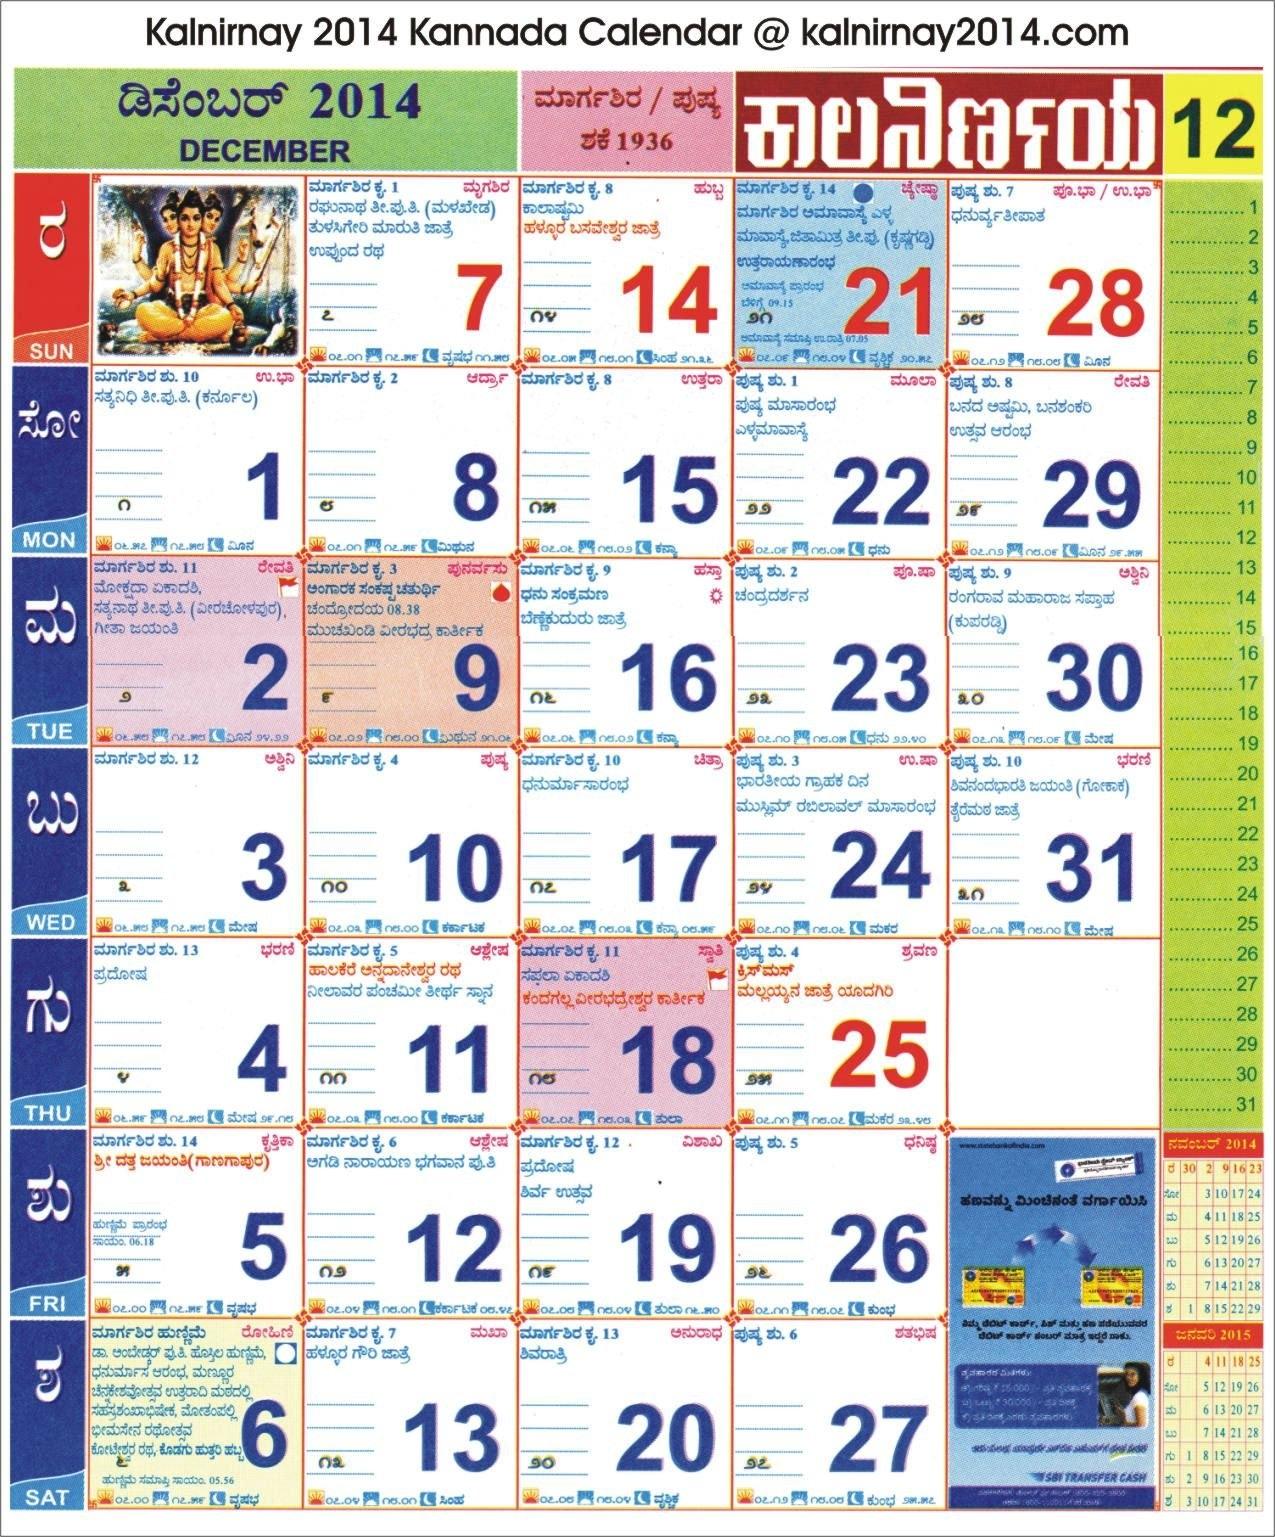 December 2014 Kannada Kalnirnay Calendar   2014 Kannada Kalnirnay Calendar 2019 Kannada